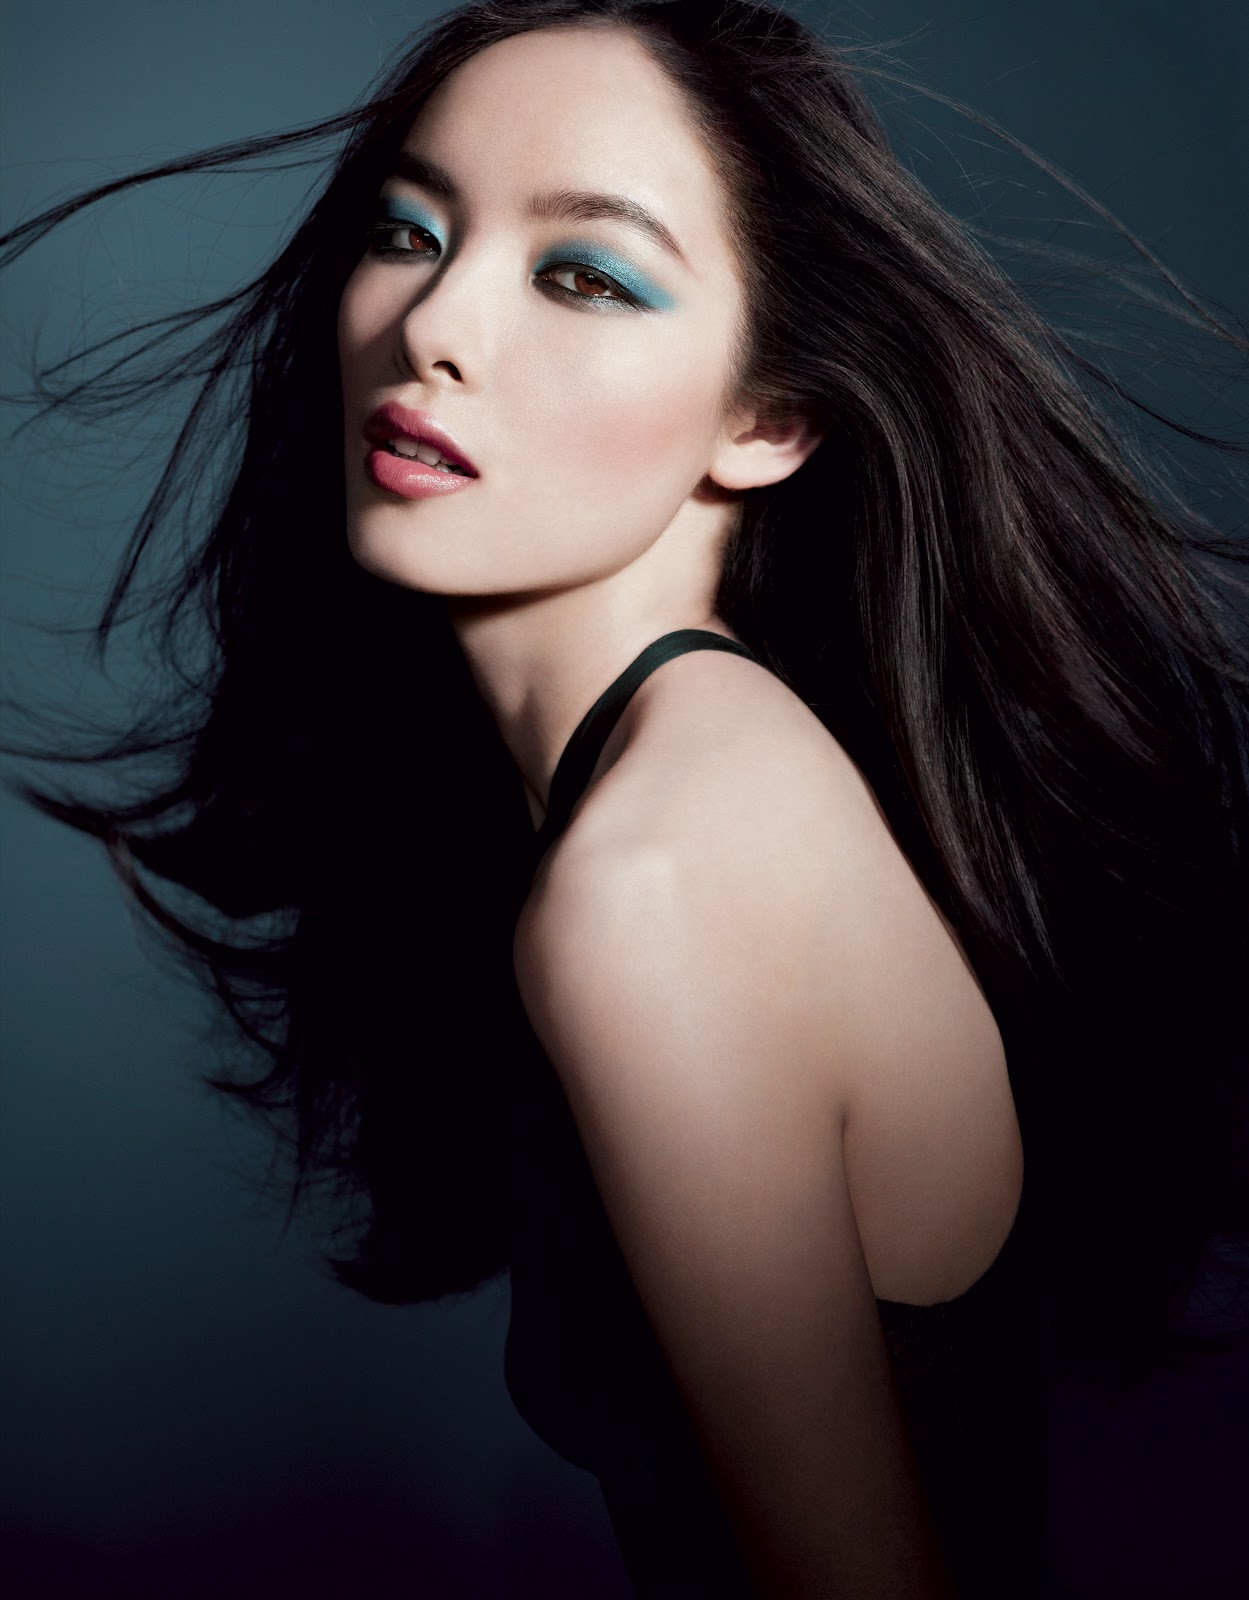 Asian Models Kana Tsugihara: ASIAN MODELS BLOG: AD CAMPAIGN: Sun Fei Fei For Giorgio